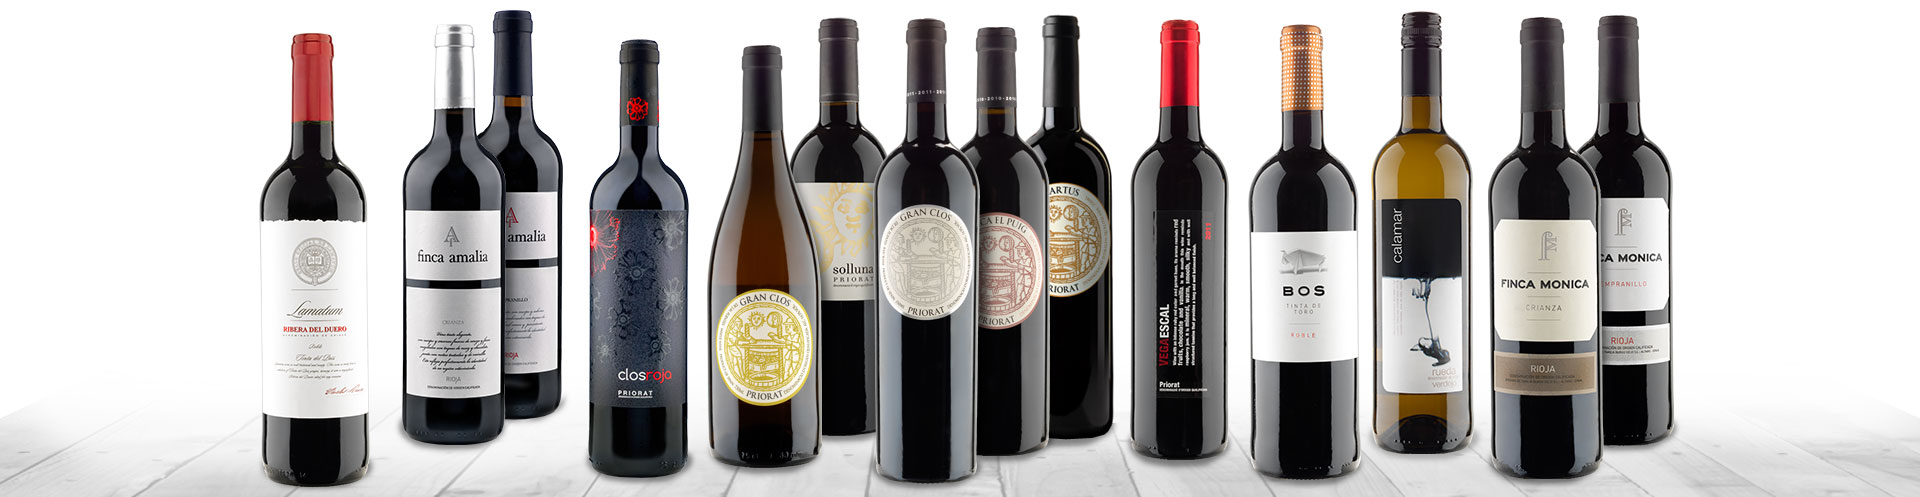 longwines-classic-spanish-wines